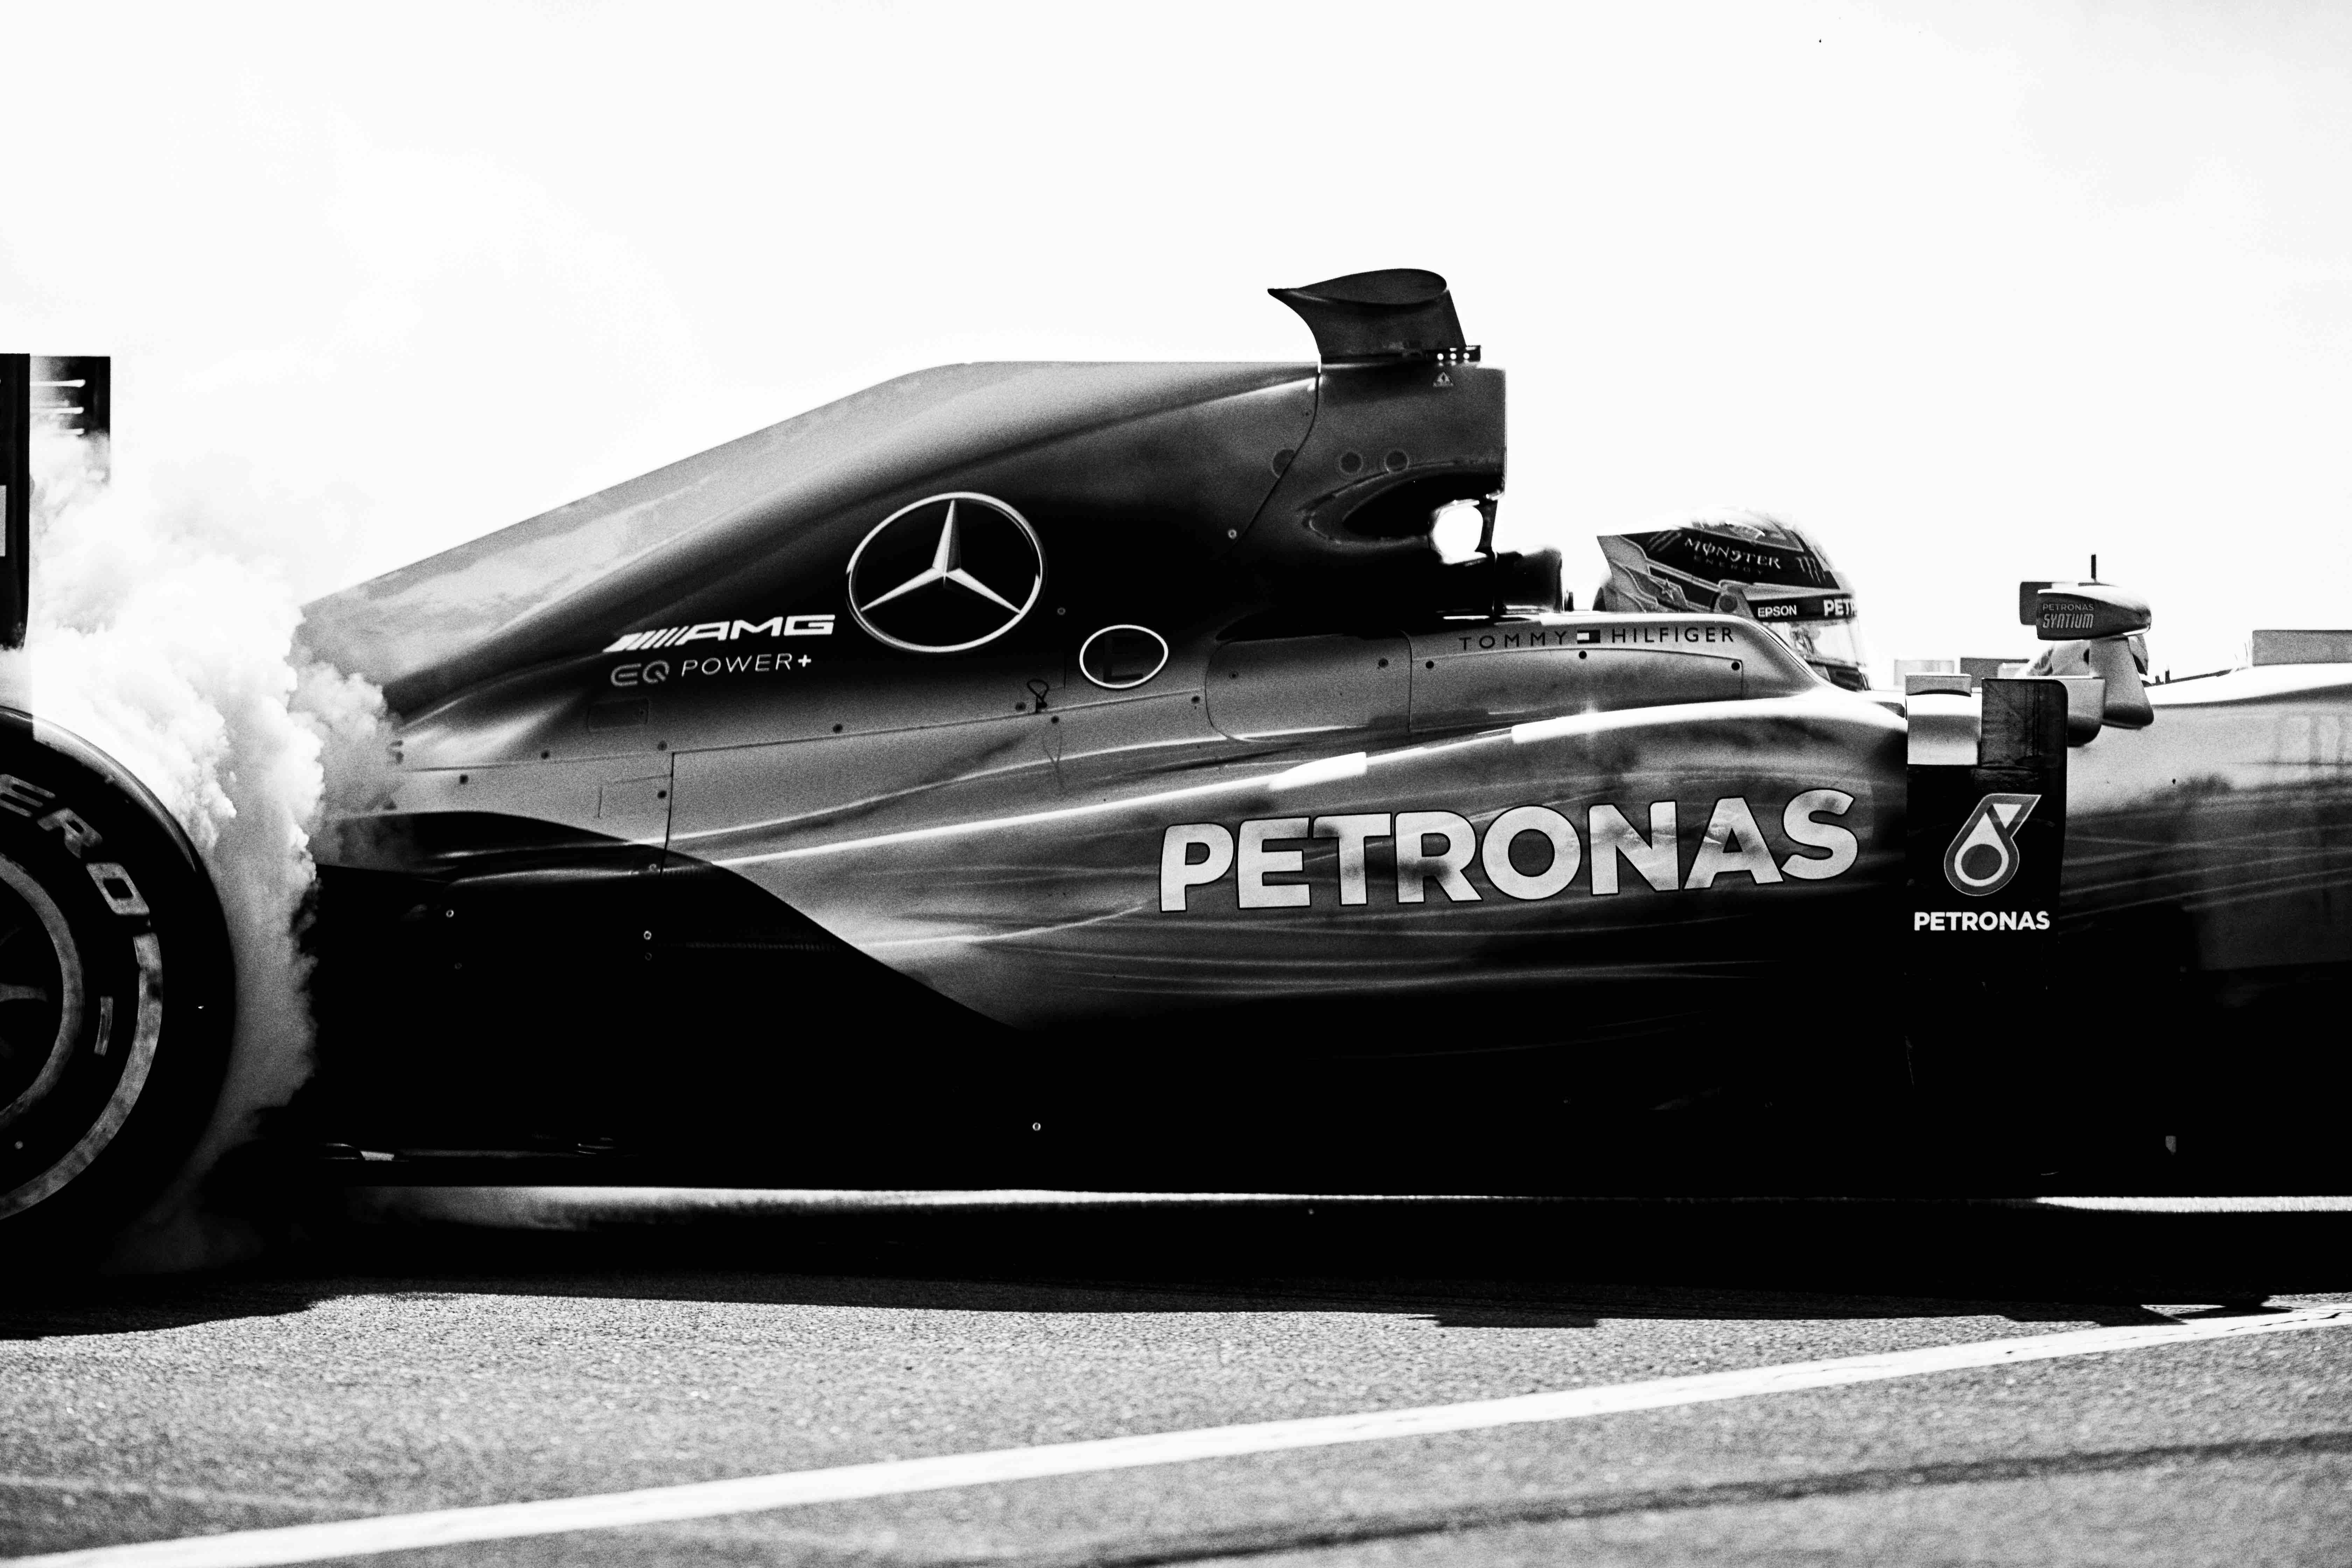 hilfiger teams with formula one world champion mercedes